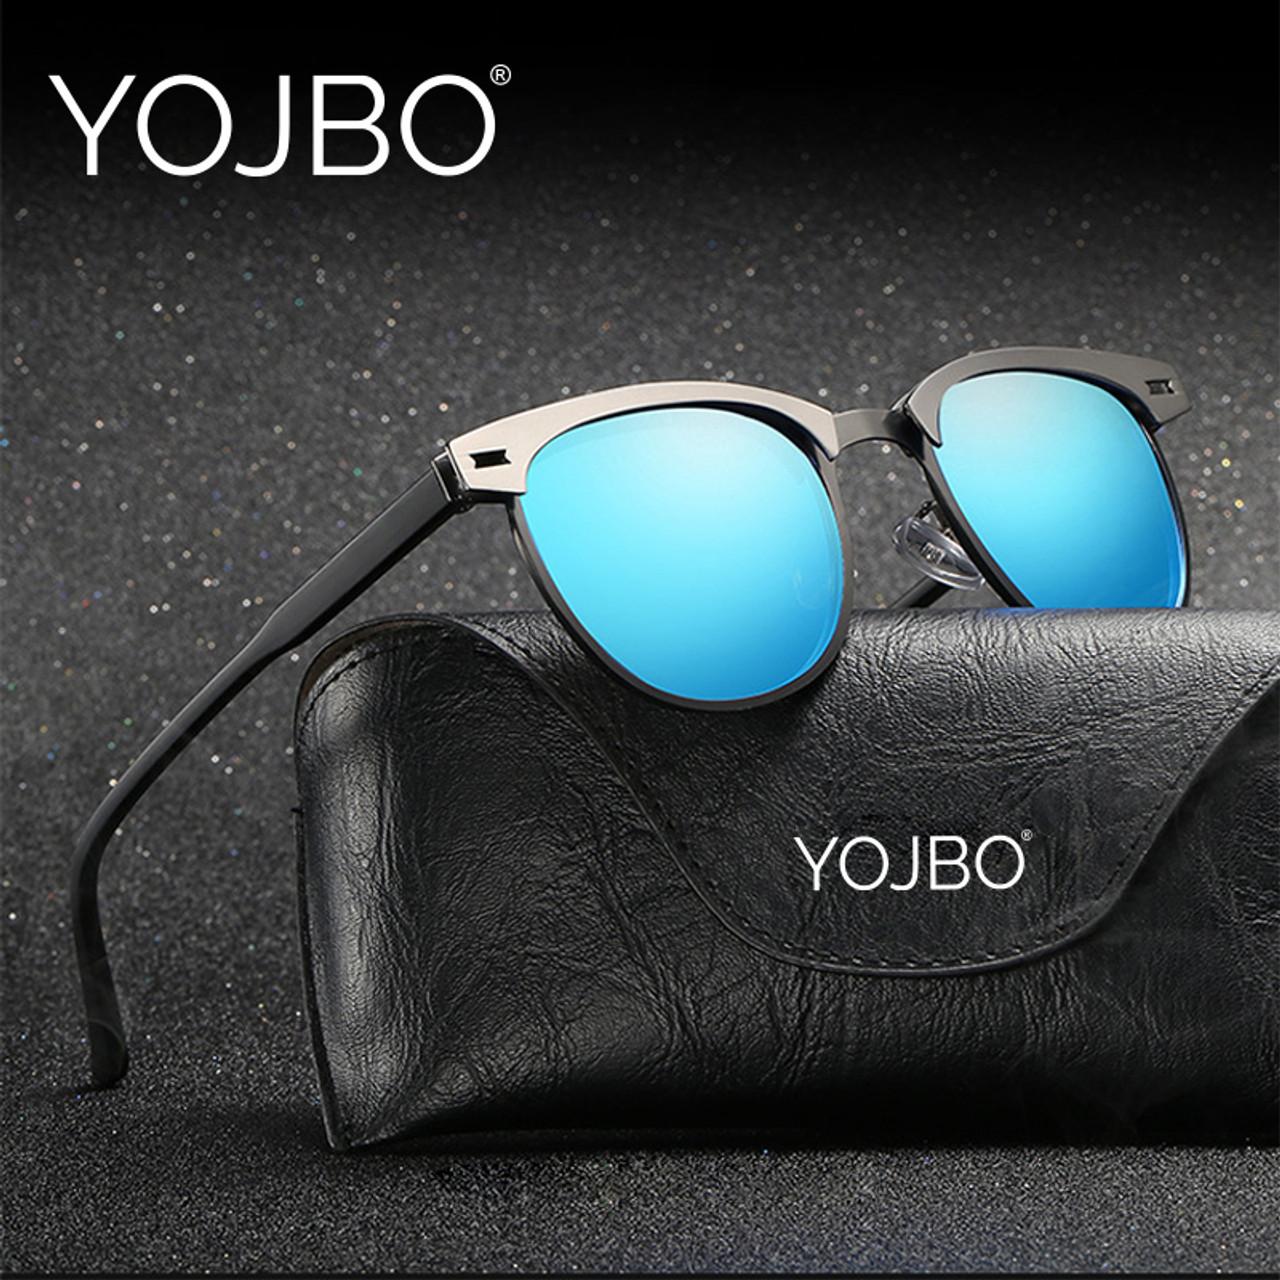 1c8132b9e6a ... YOJBO Aviator Sunglasses Men Polarized 2018 Male Ladies Retro Mirror Women  Vintage Shades Luxury Brand Designe ...